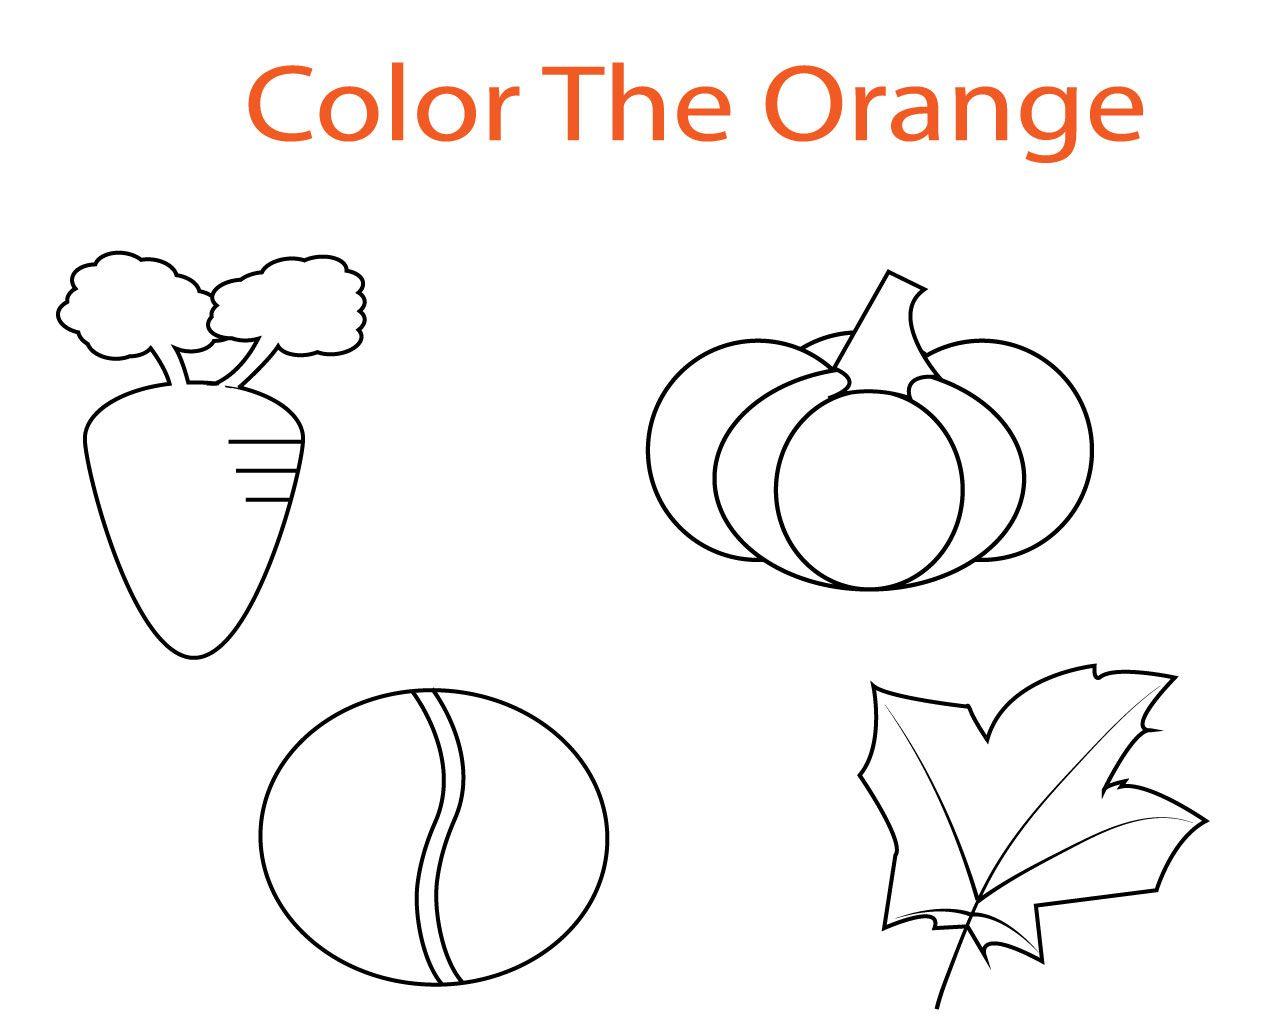 Orange Things Coloring Pages Crayola Coloring Pages Fruit Coloring Pages Free Online Coloring [ 1024 x 1280 Pixel ]